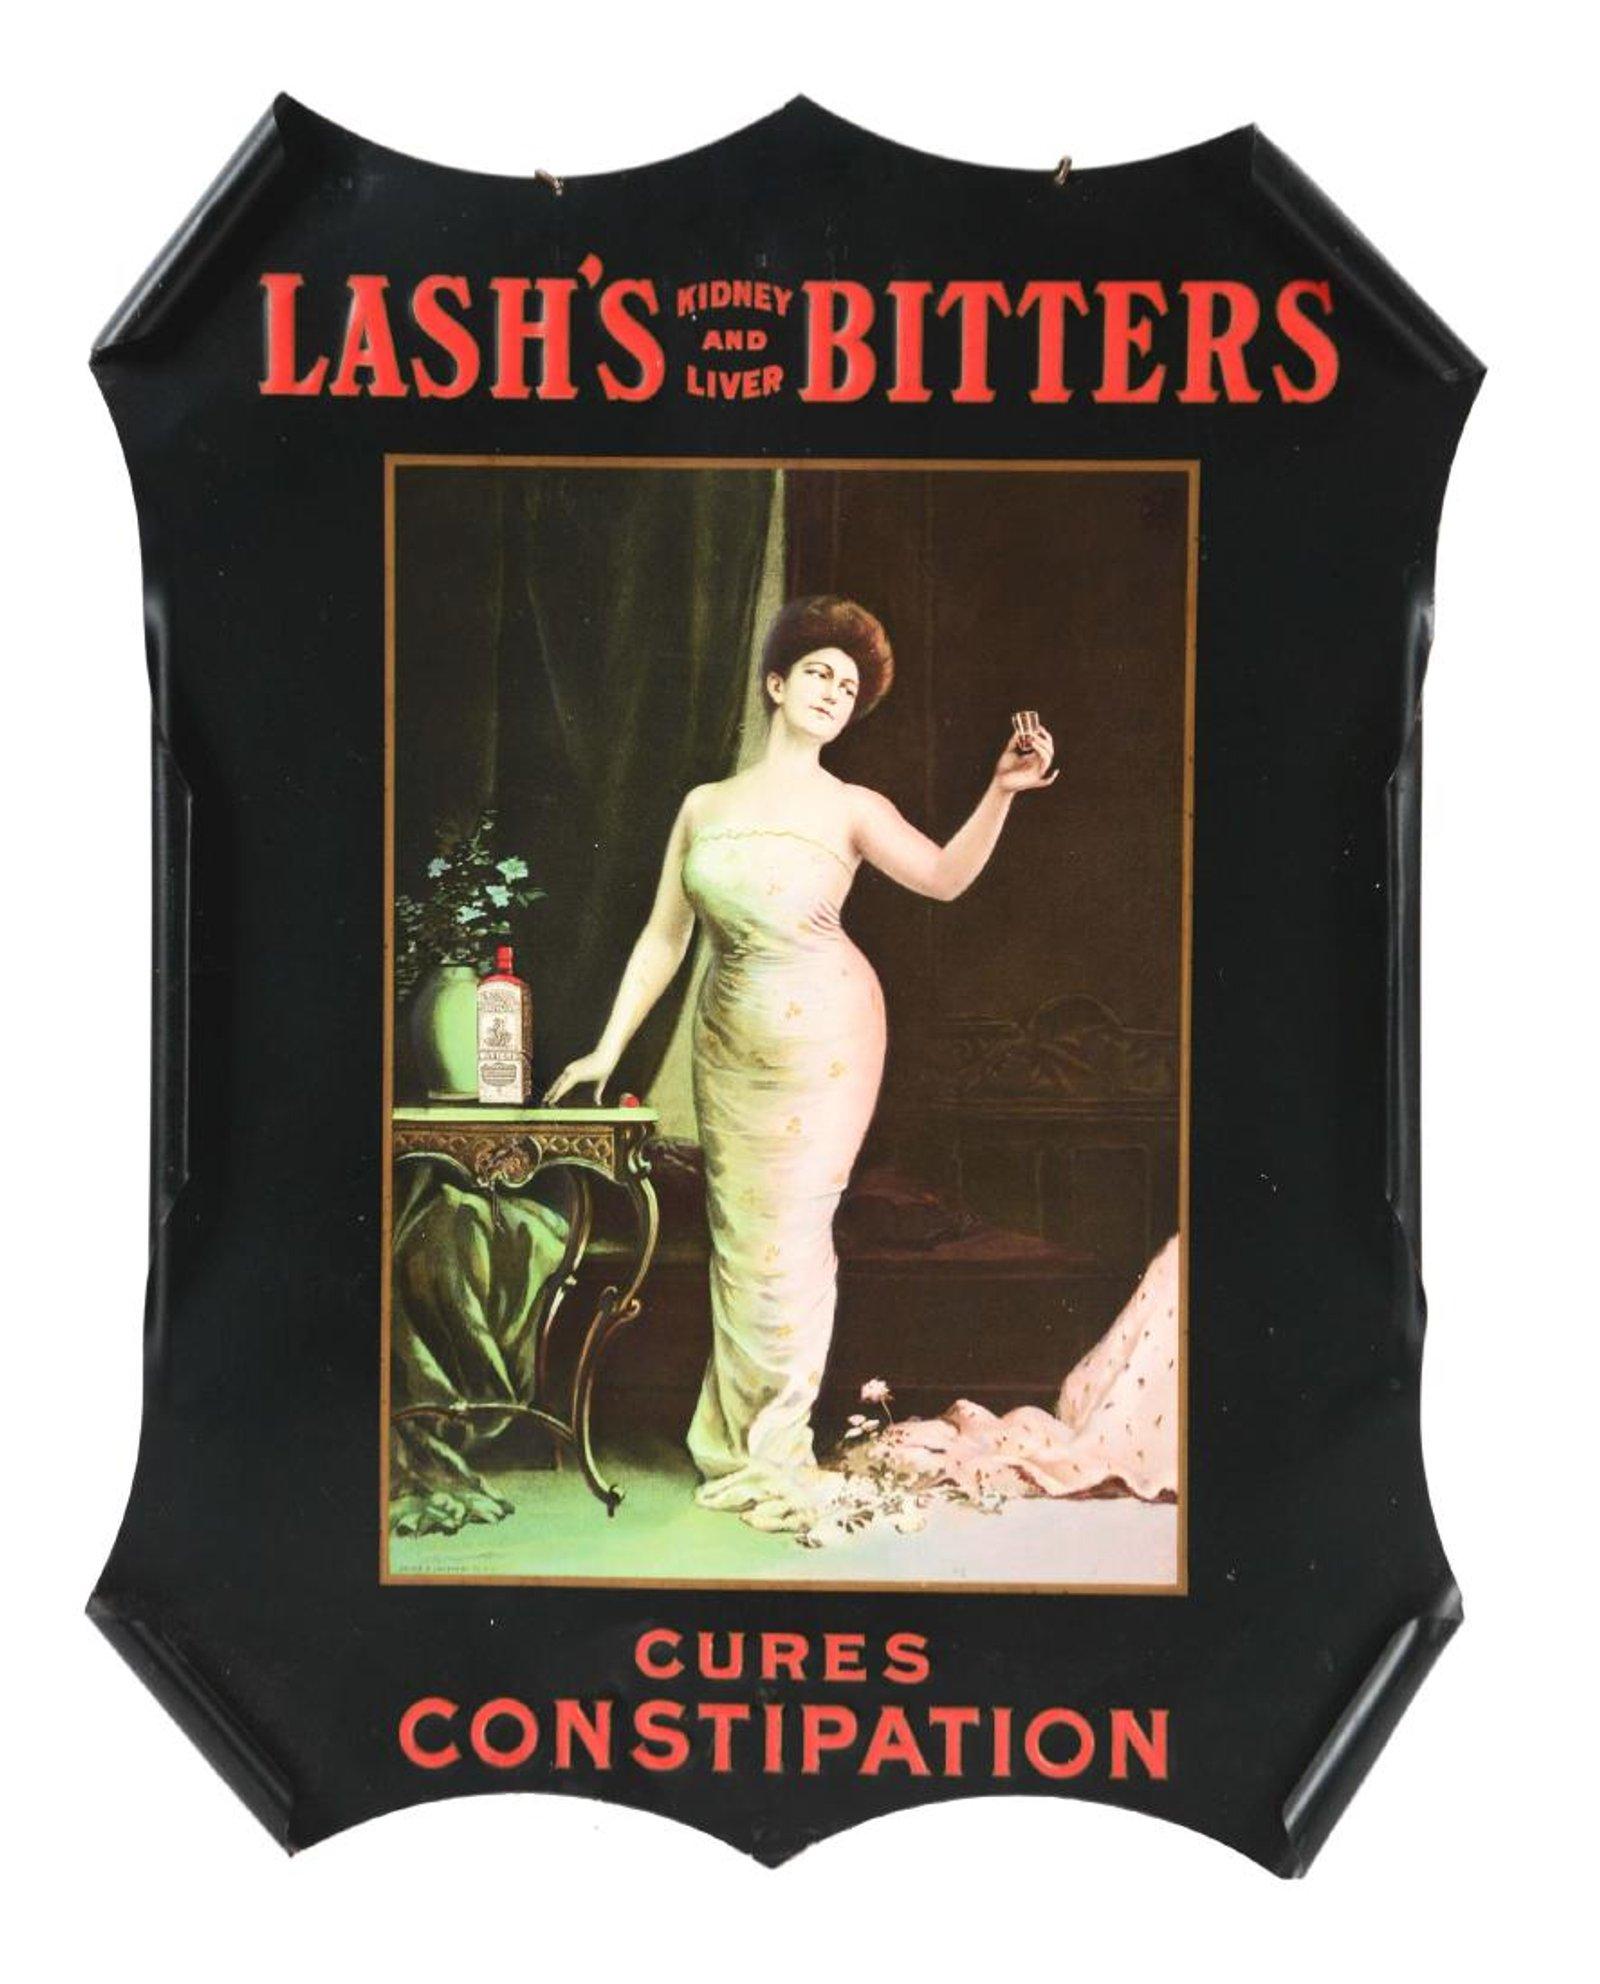 Lash's Kidney & Liver Bitters Tin Sign. Circa 1900